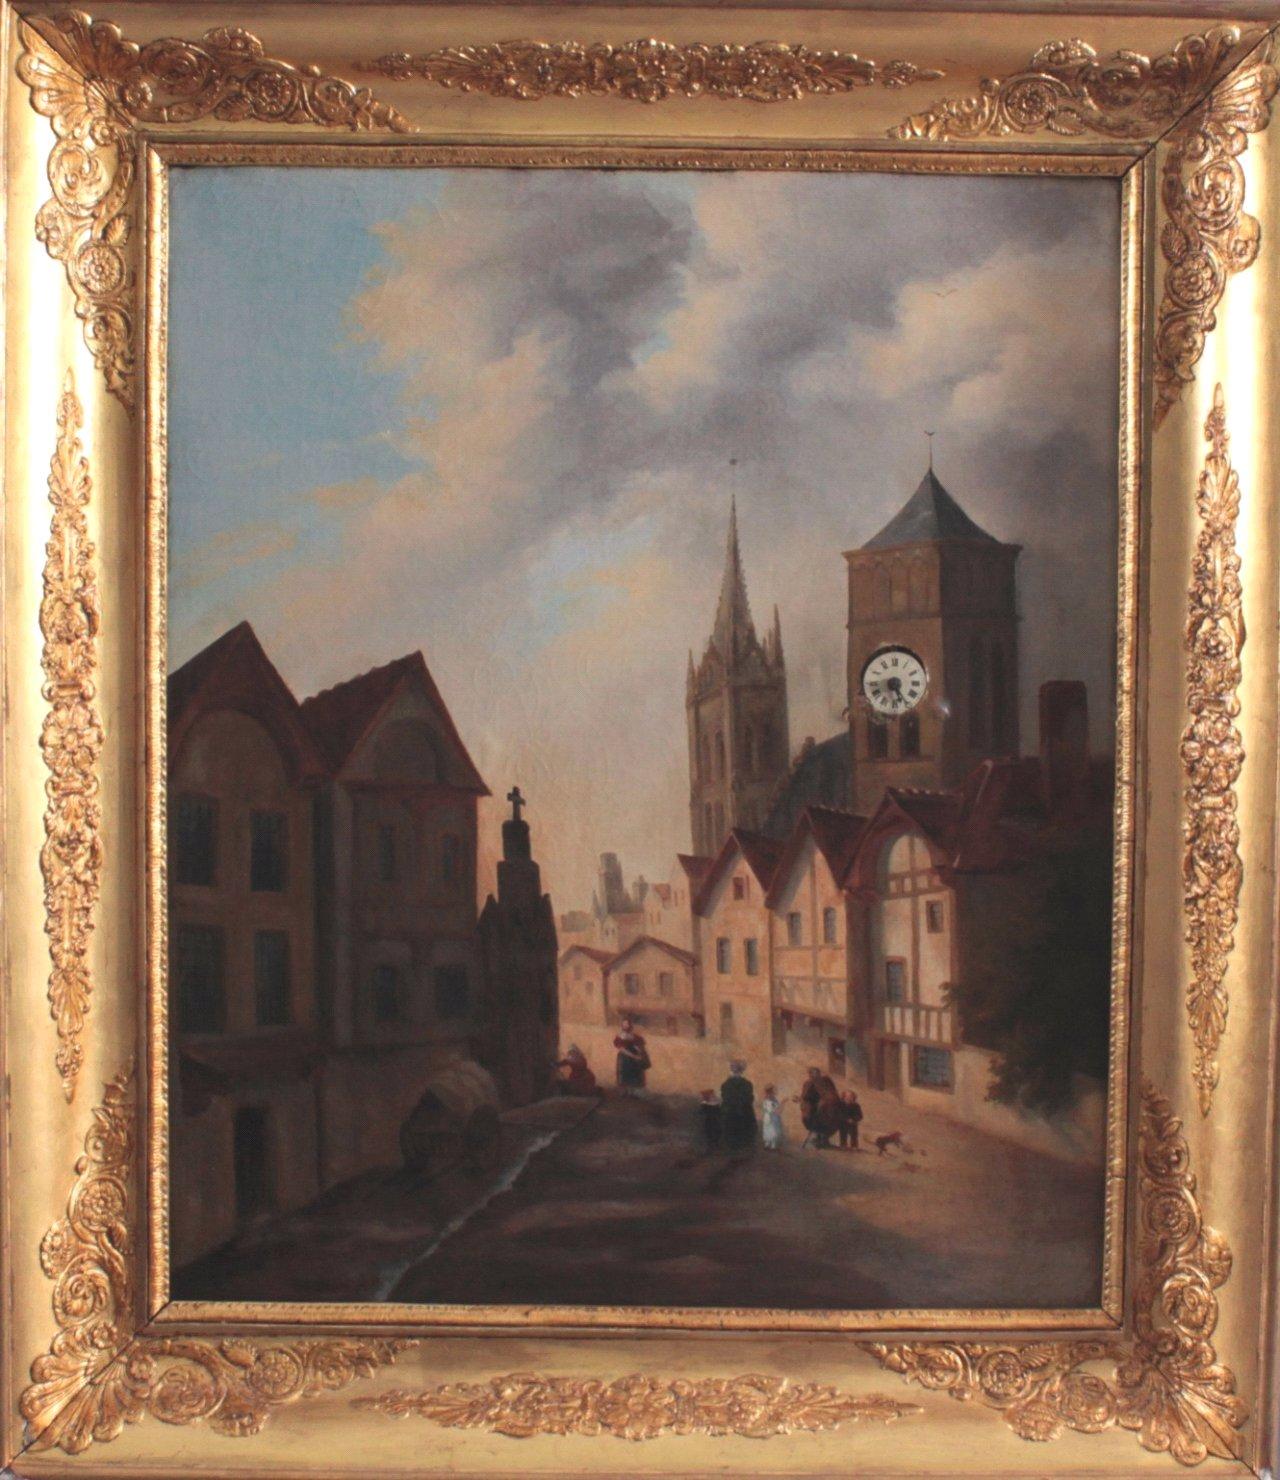 Bilderuhr mit Motiv des Straßburger Münsters